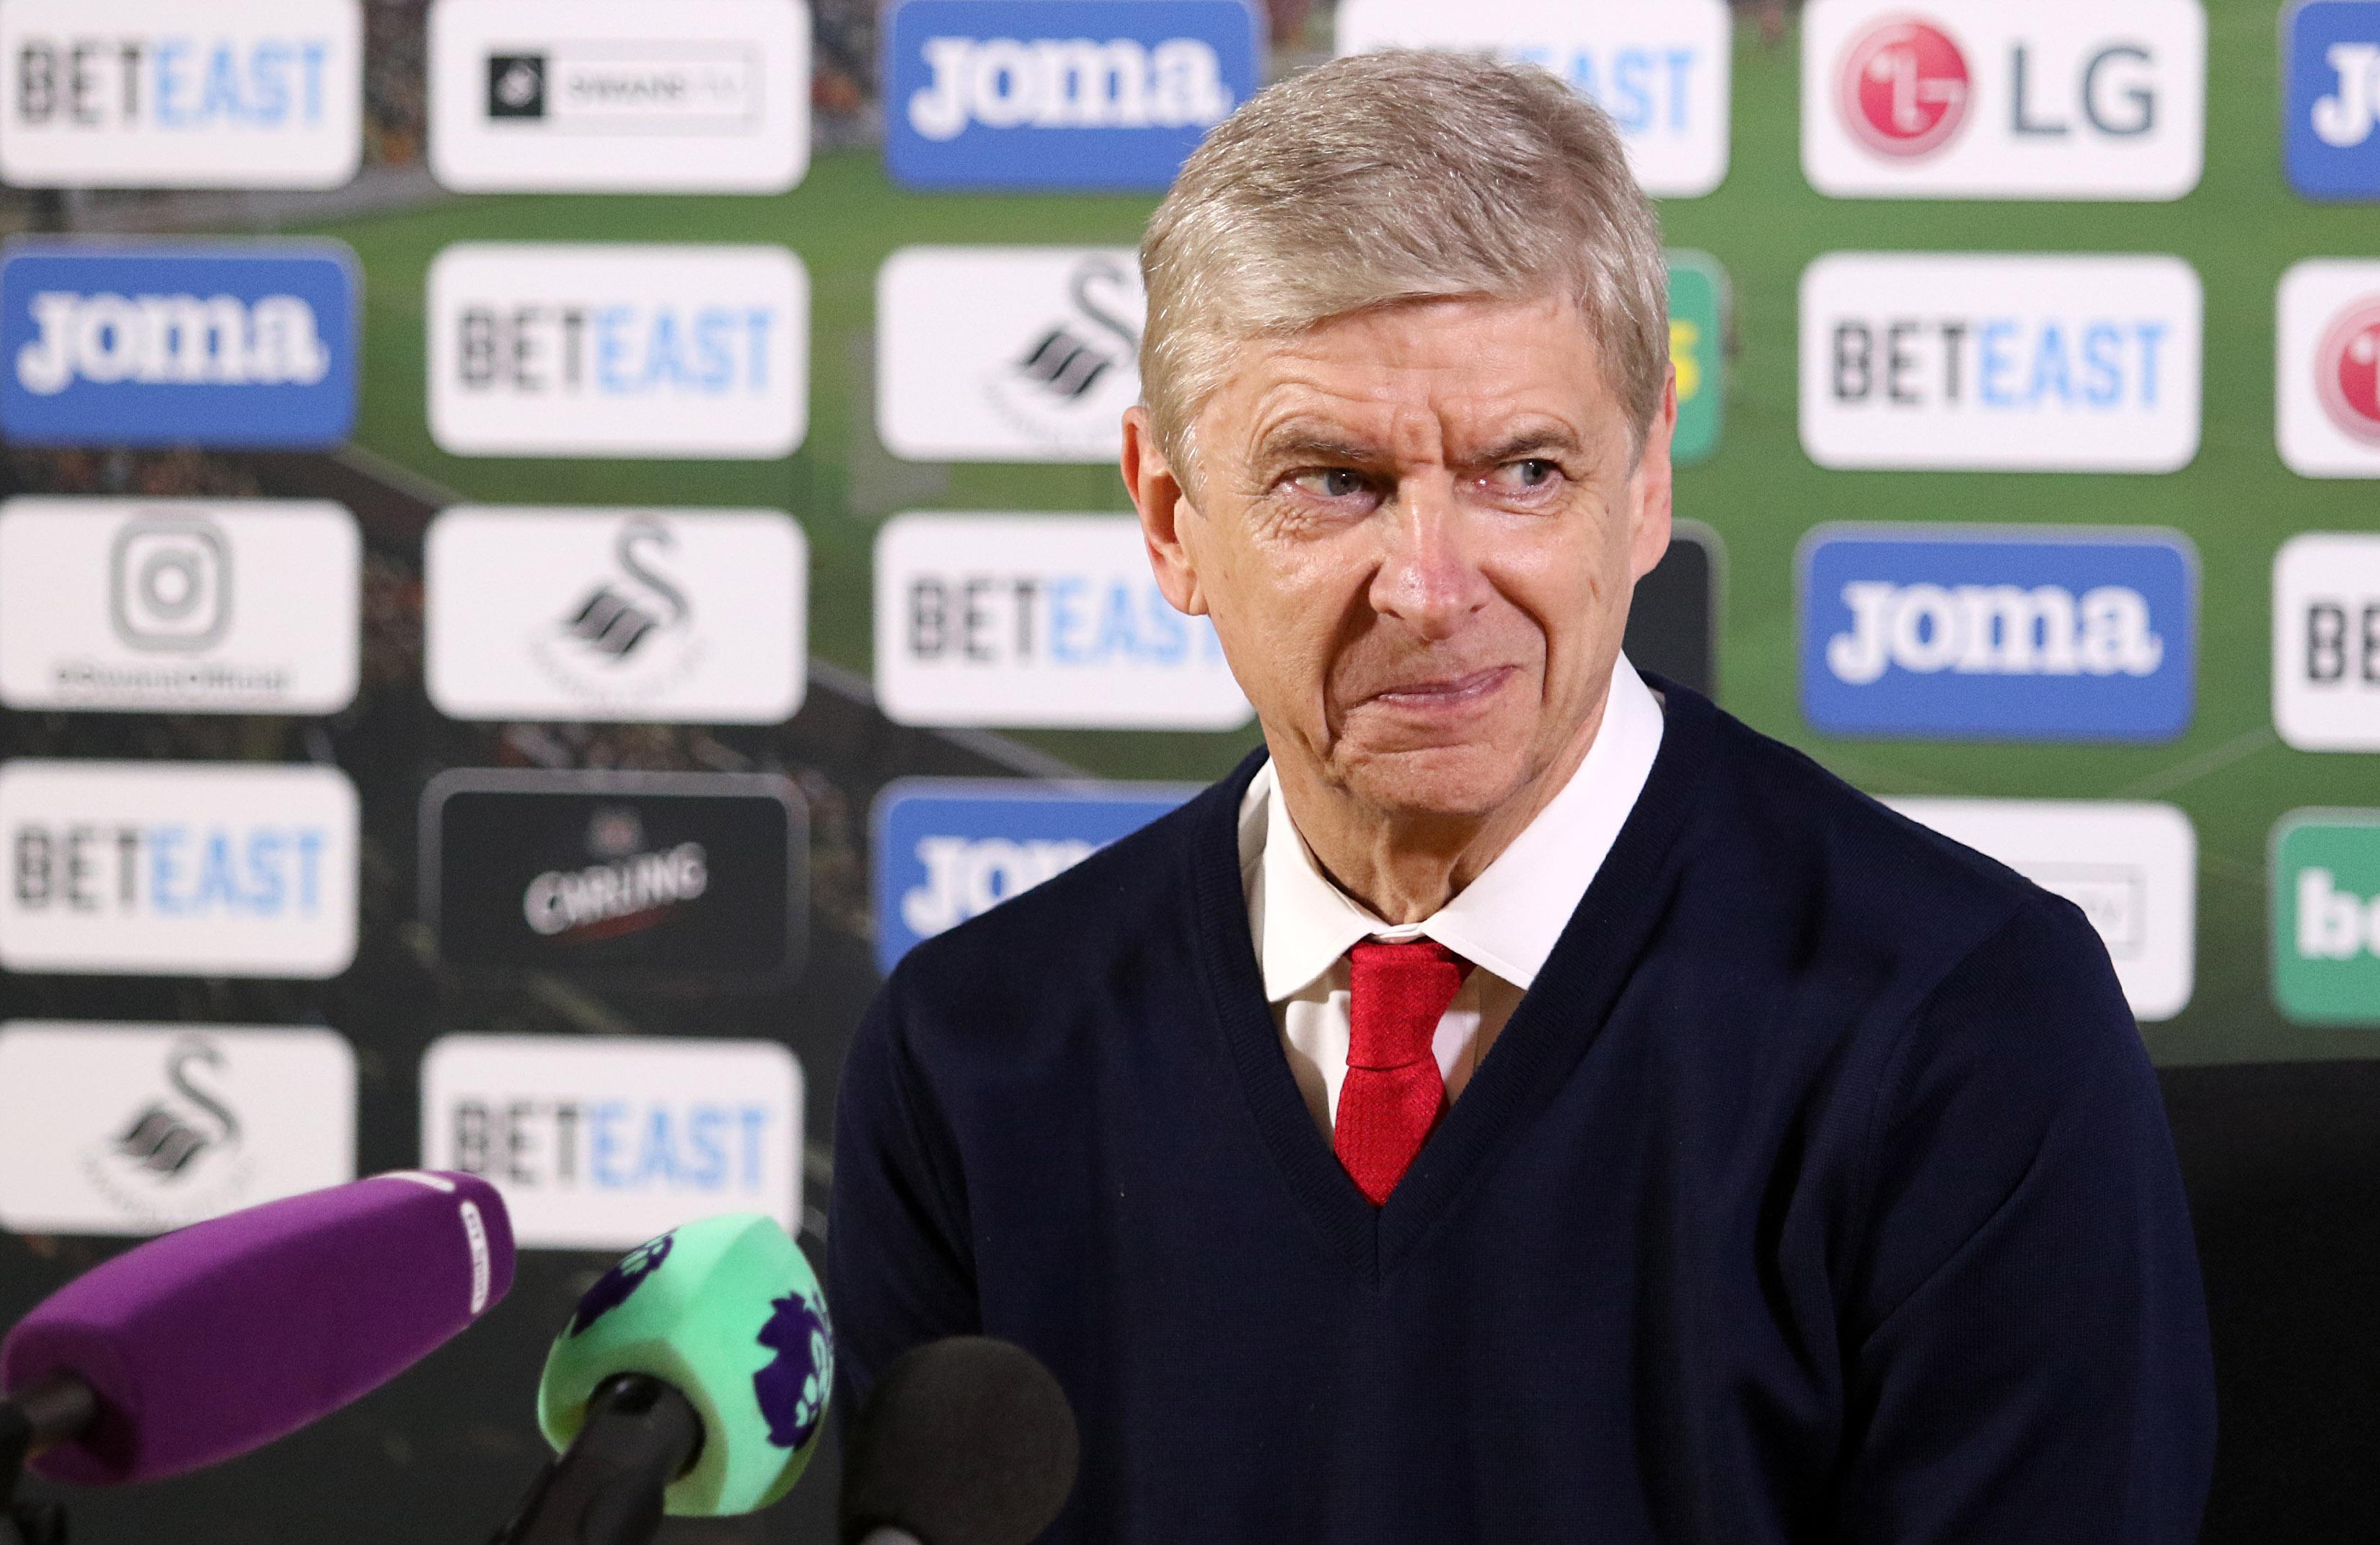 Arsene Wenger rules out move for West Ham ace Dimitri Payet despite 'interest'